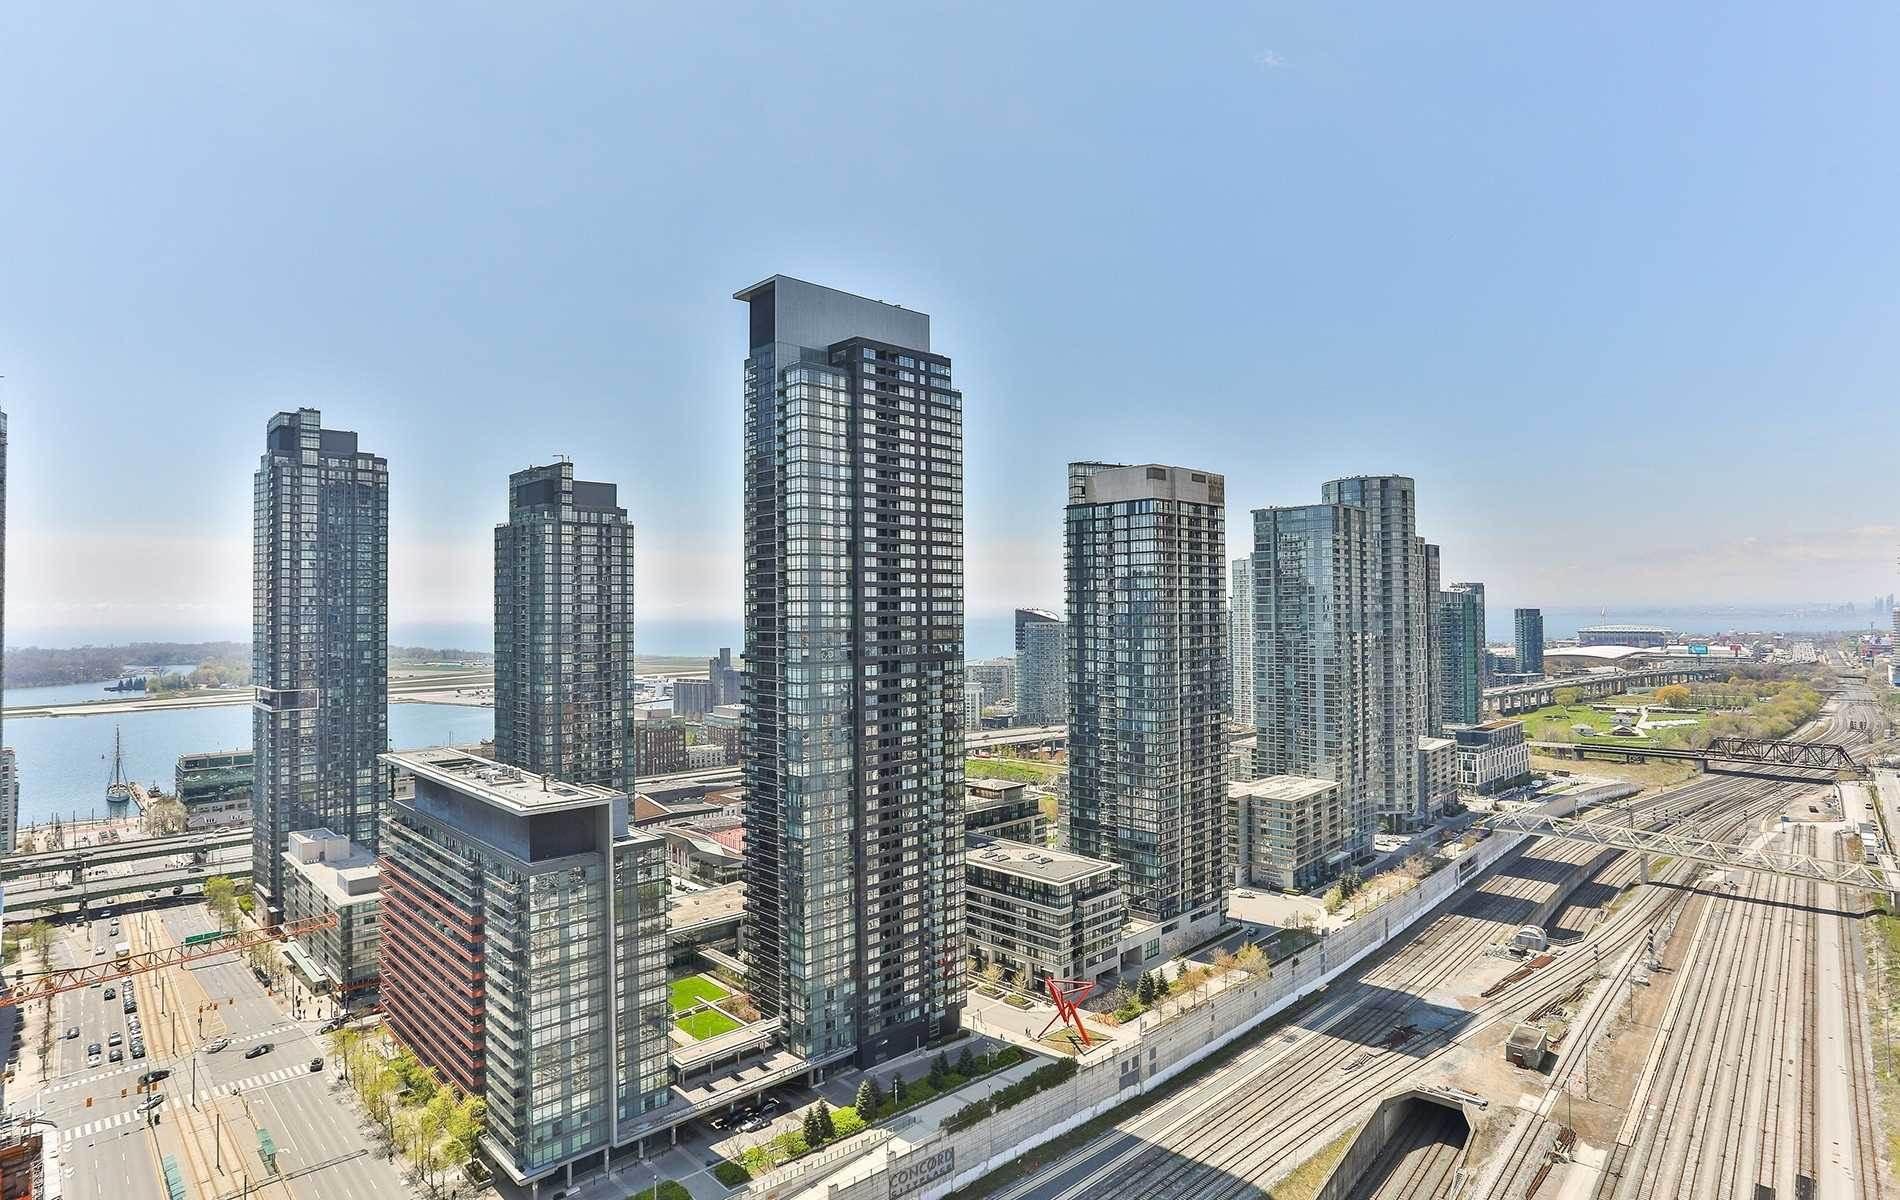 397 Front St W, Toronto Condo For Sale